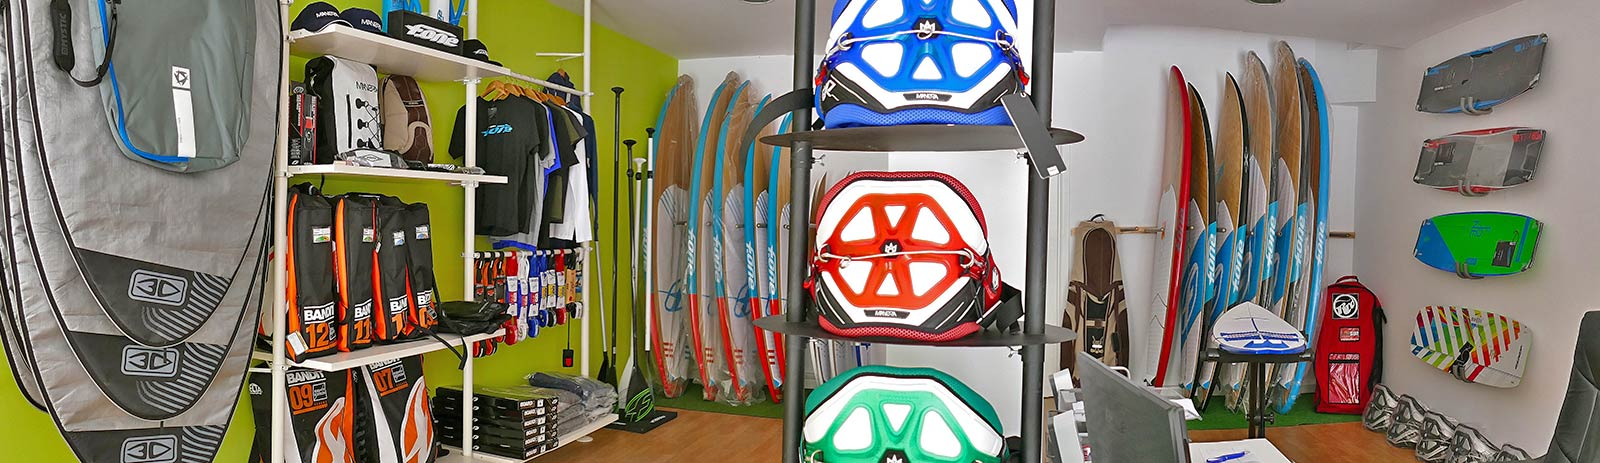 showroom kite sup hydrofoil carver